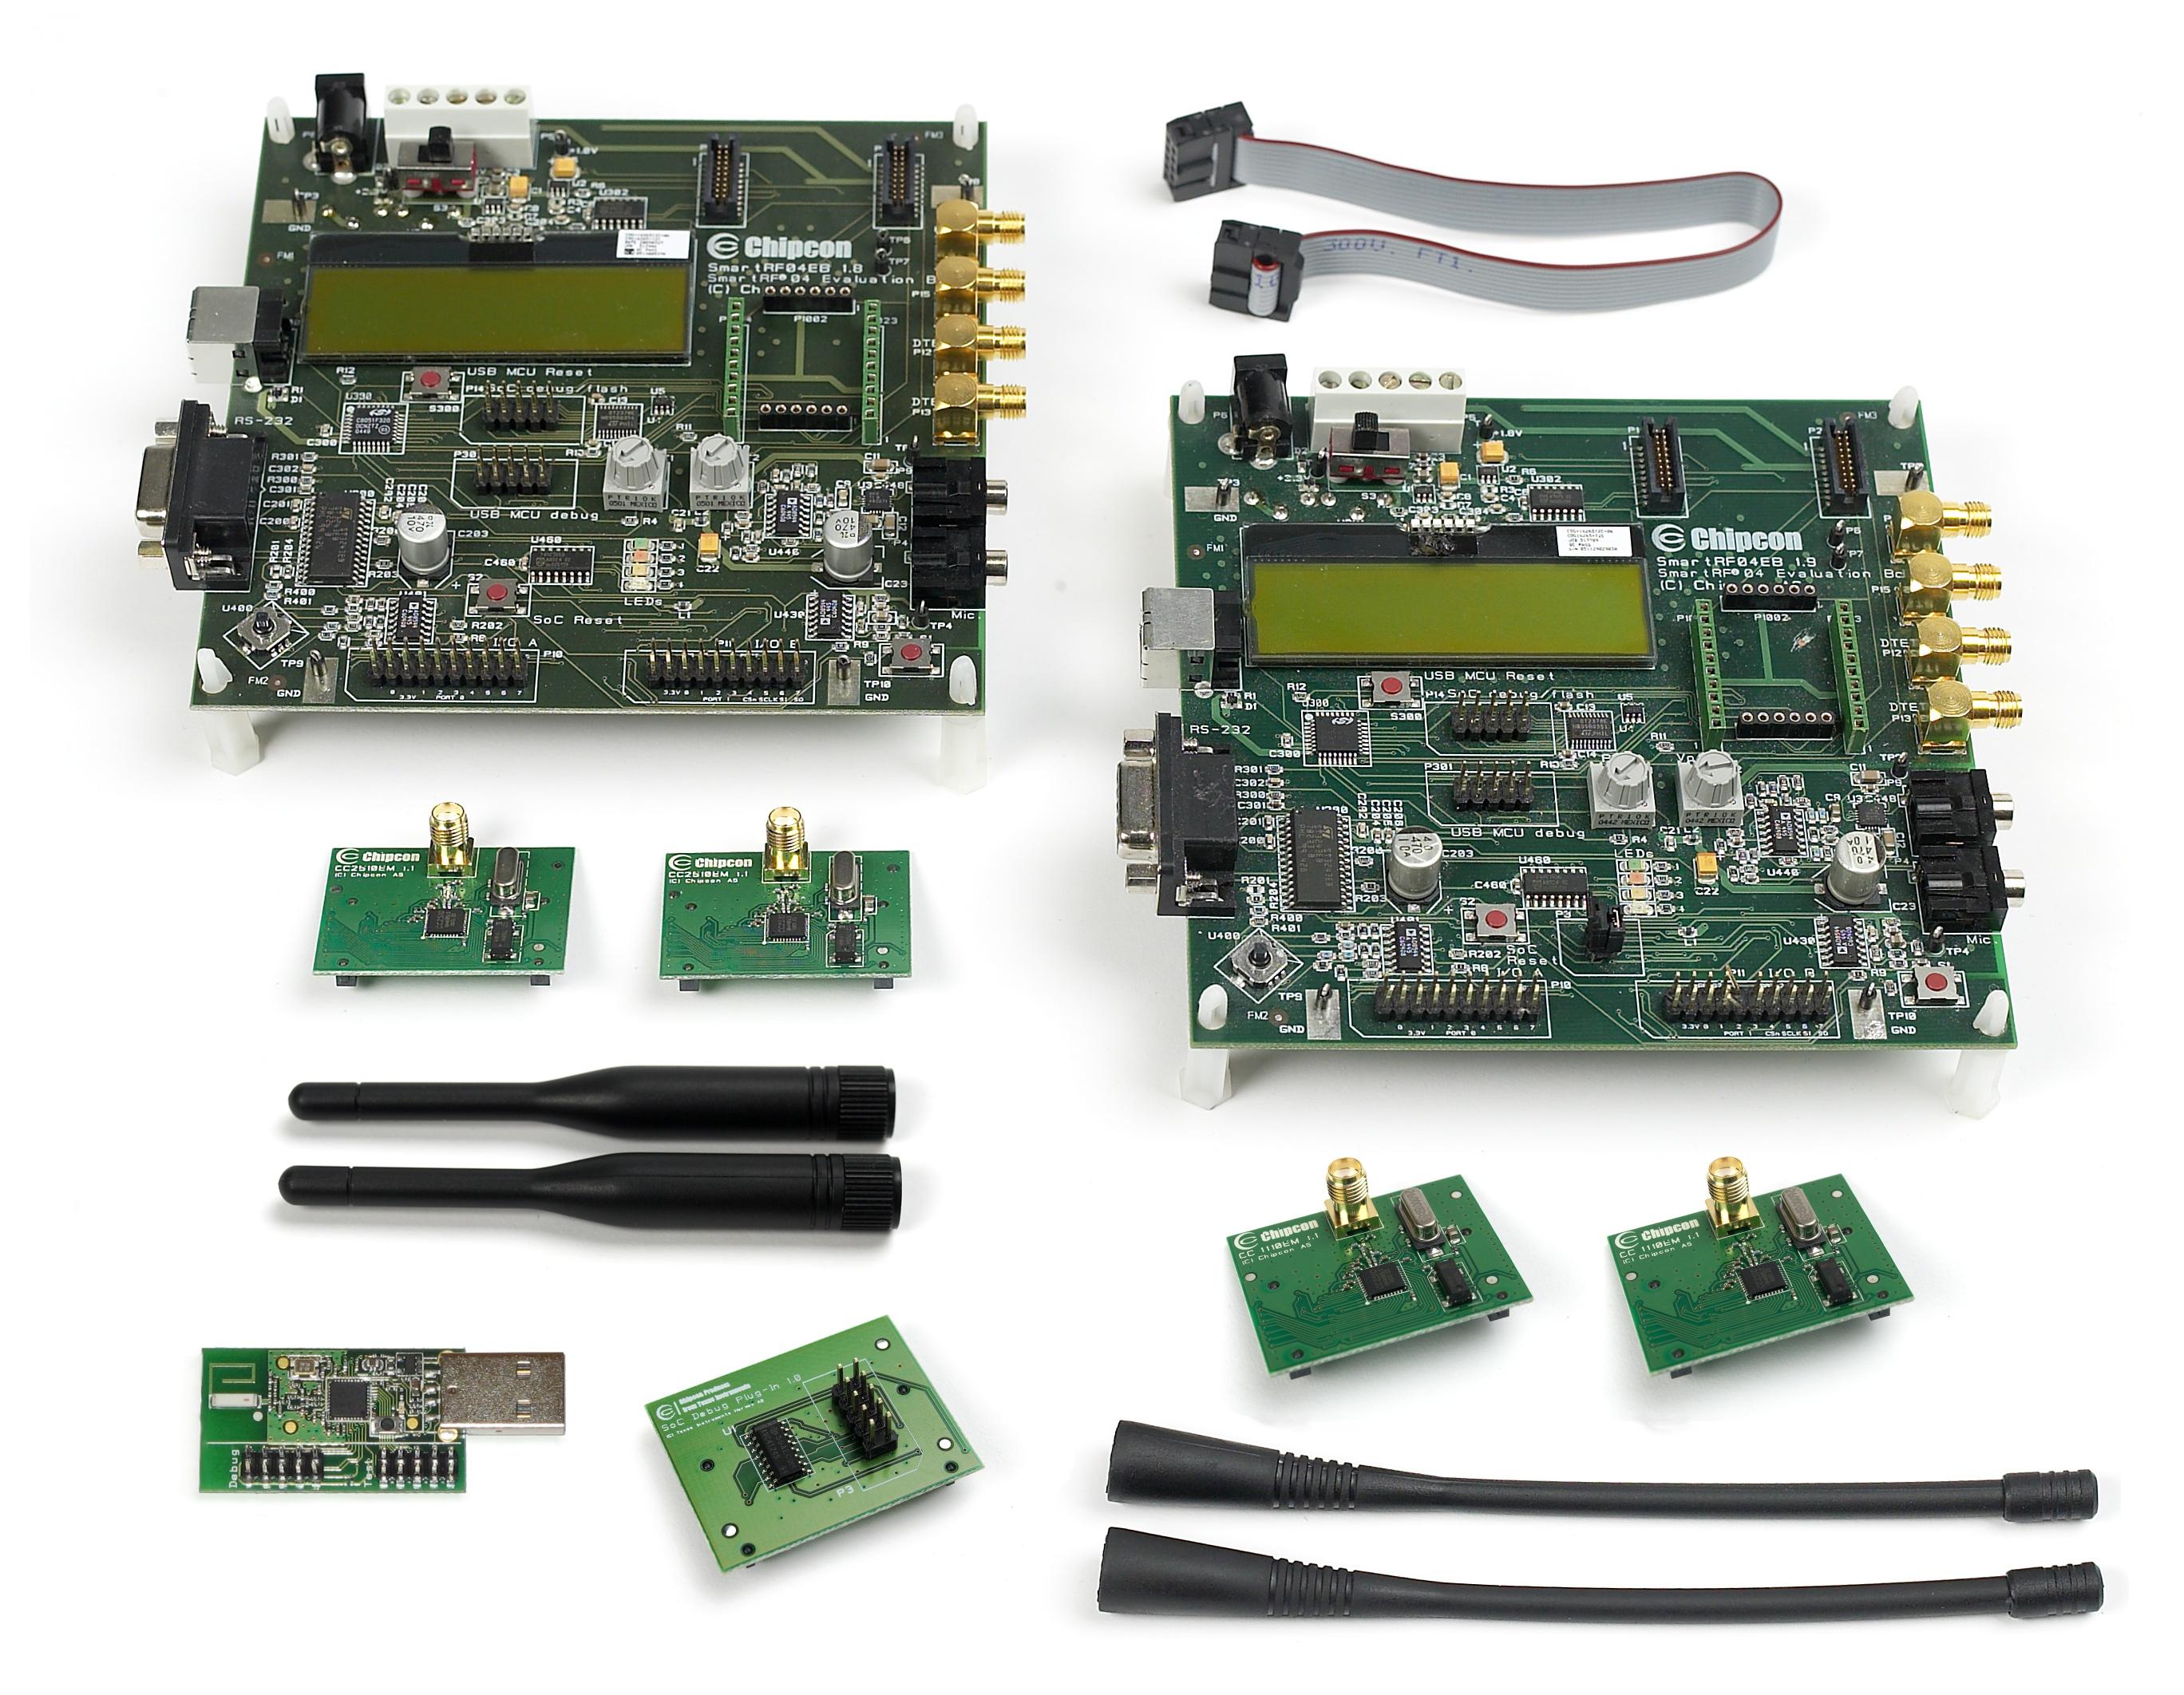 Cc1110-cc1111 | microcontroller | analog to digital converter.